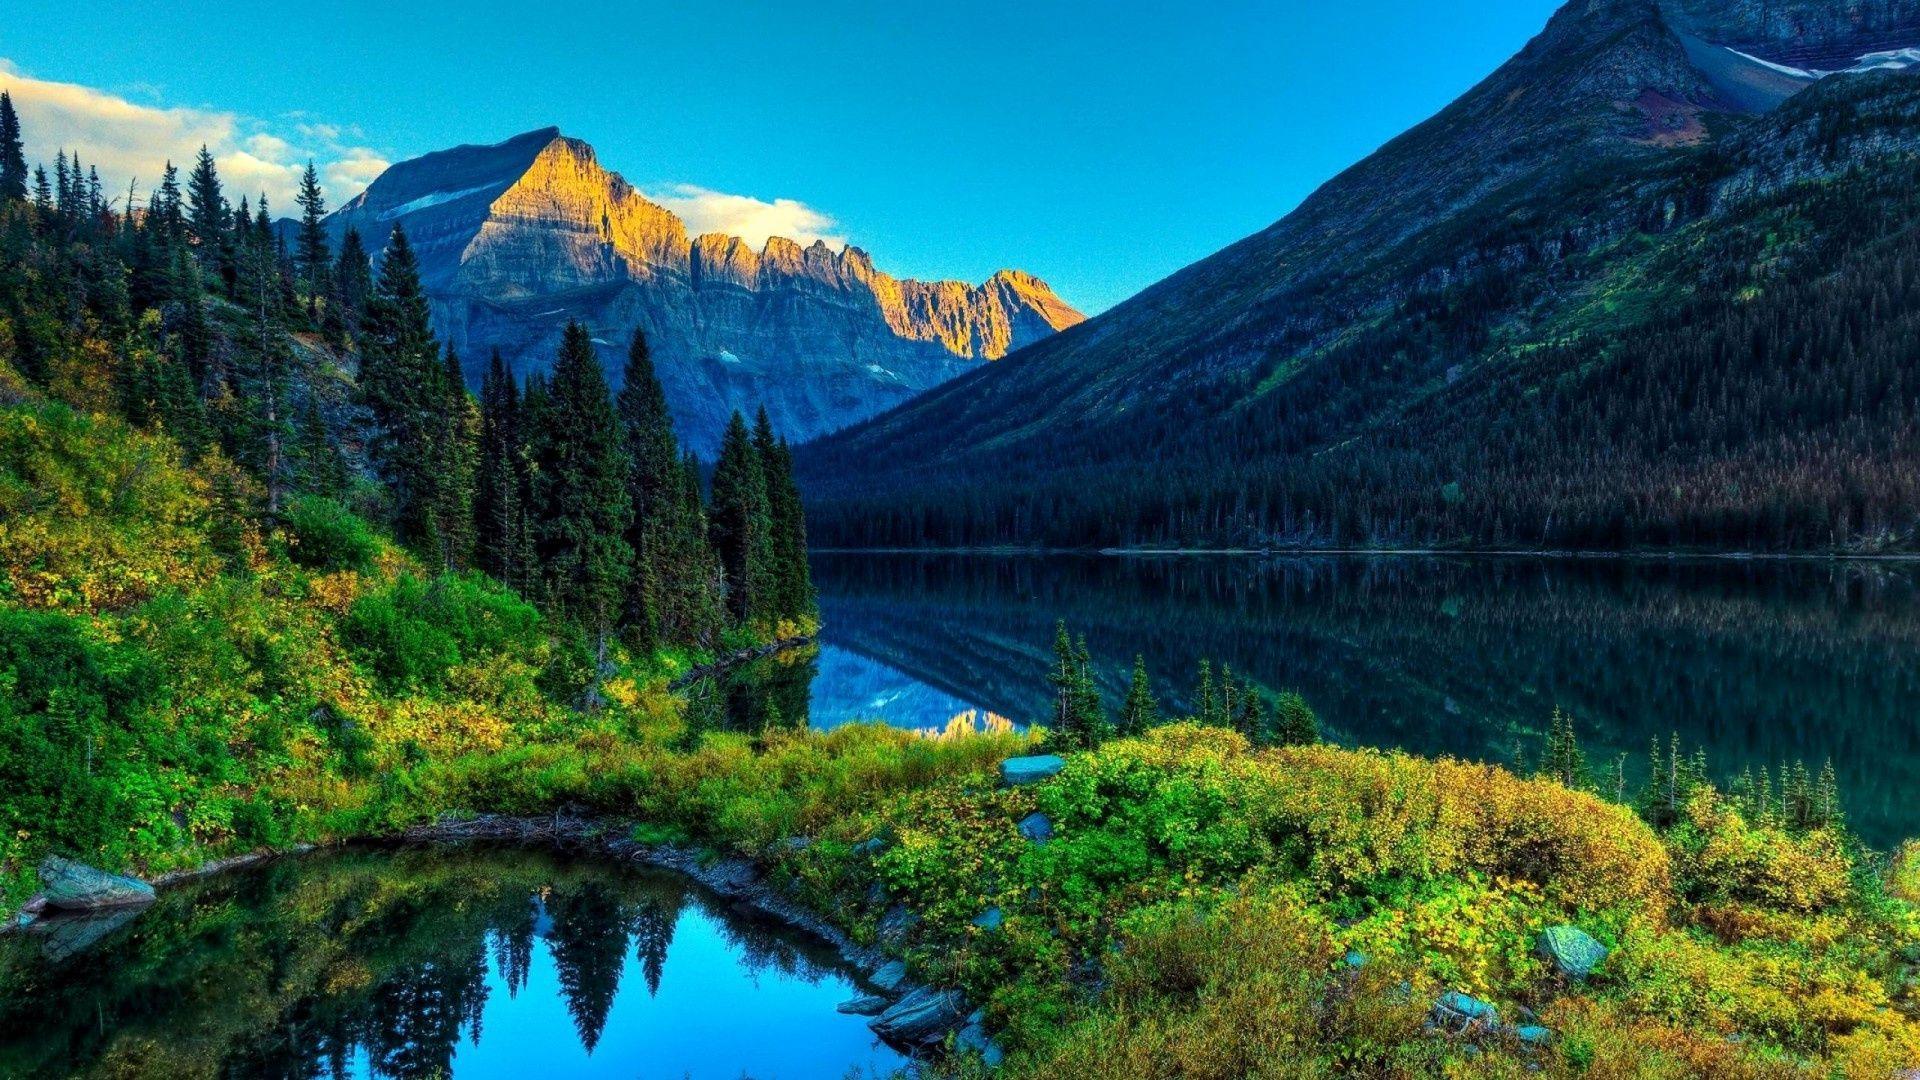 High Resolution Desktop Wallpapers Top Free High Resolution Desktop Backgrounds Wallpaperaccess